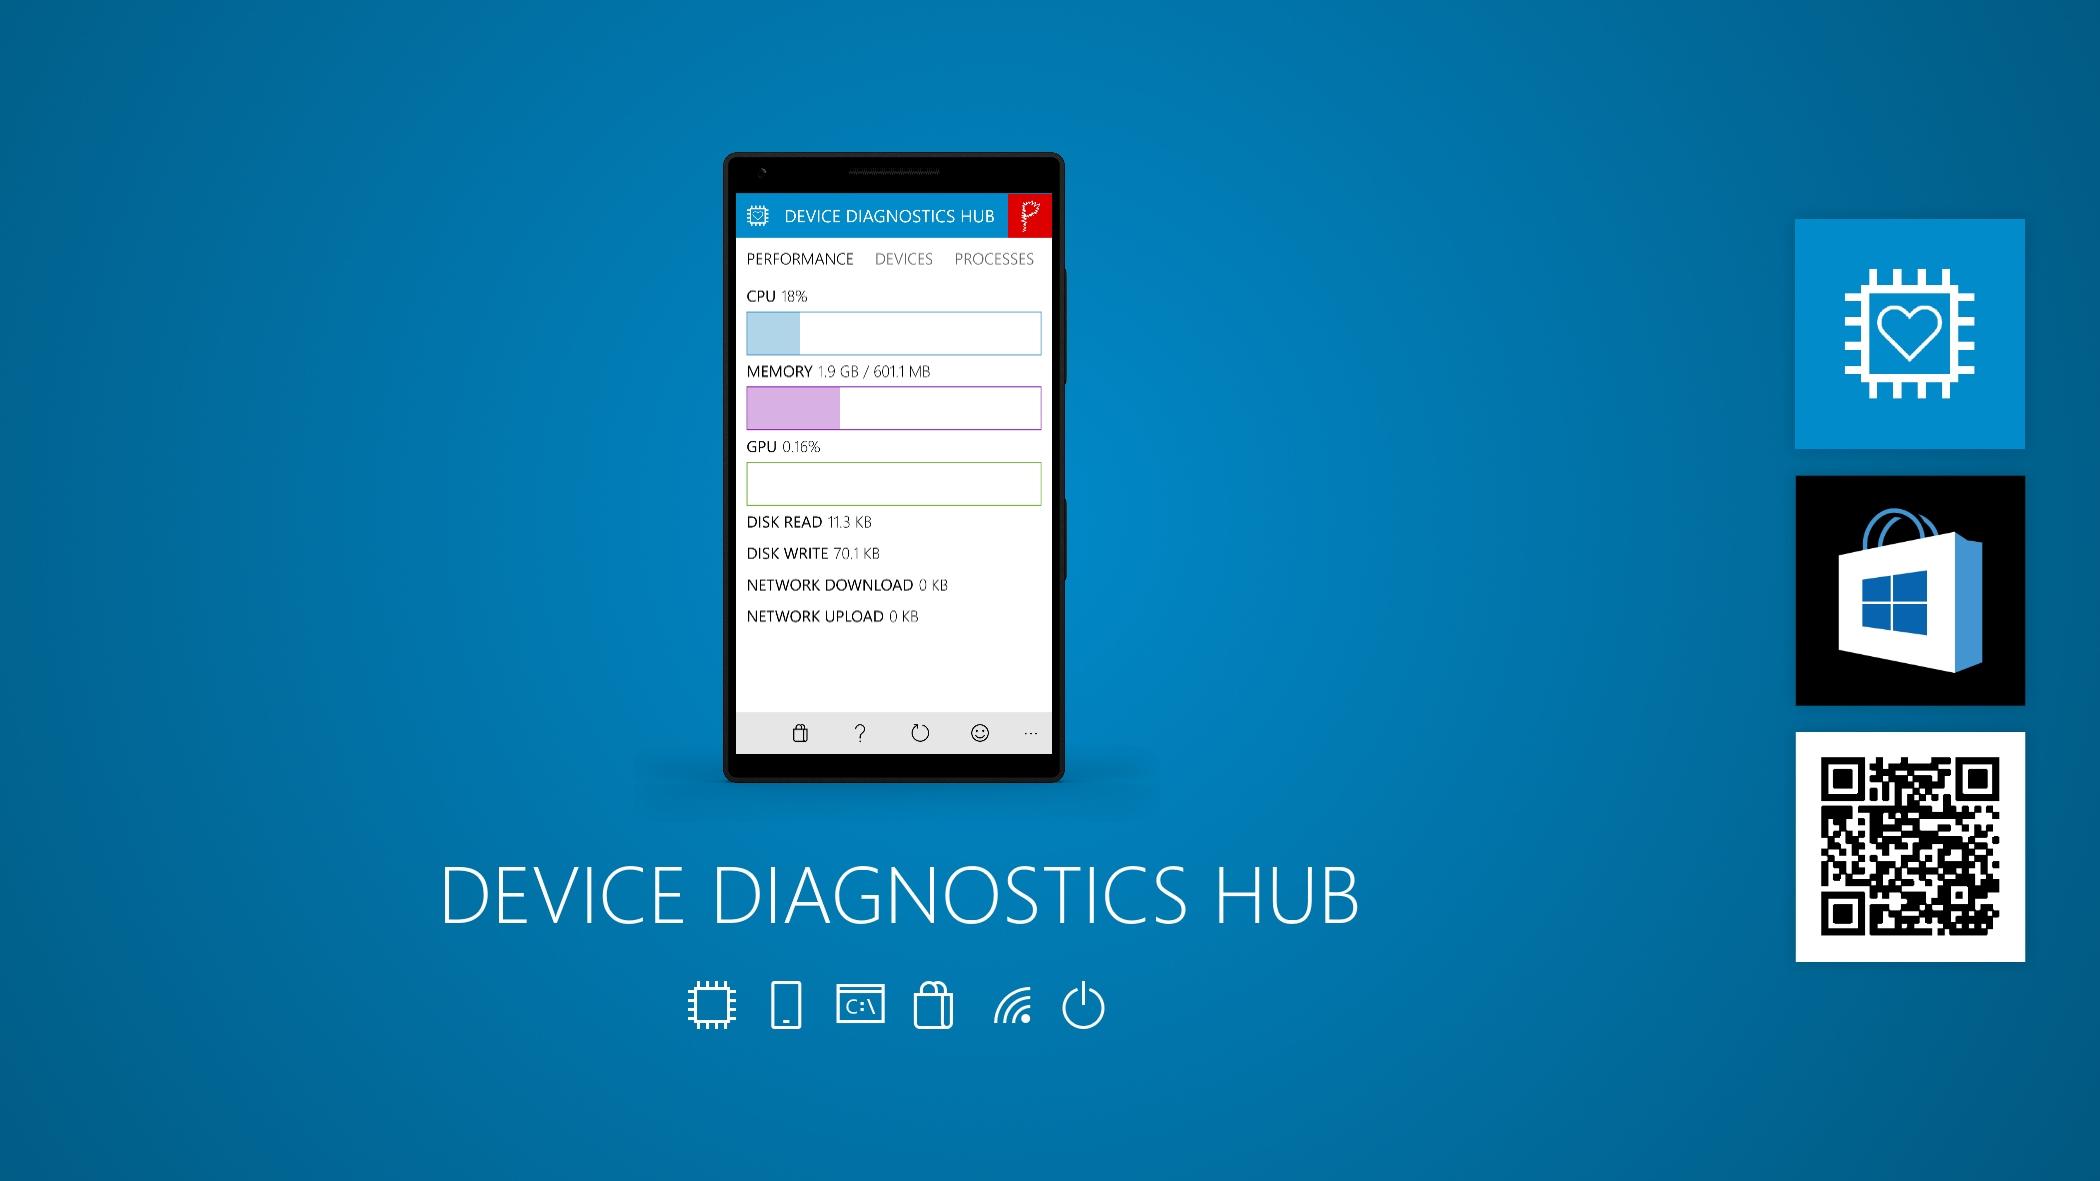 device-diagnostics-hub-task-manager-windows-10-mobile